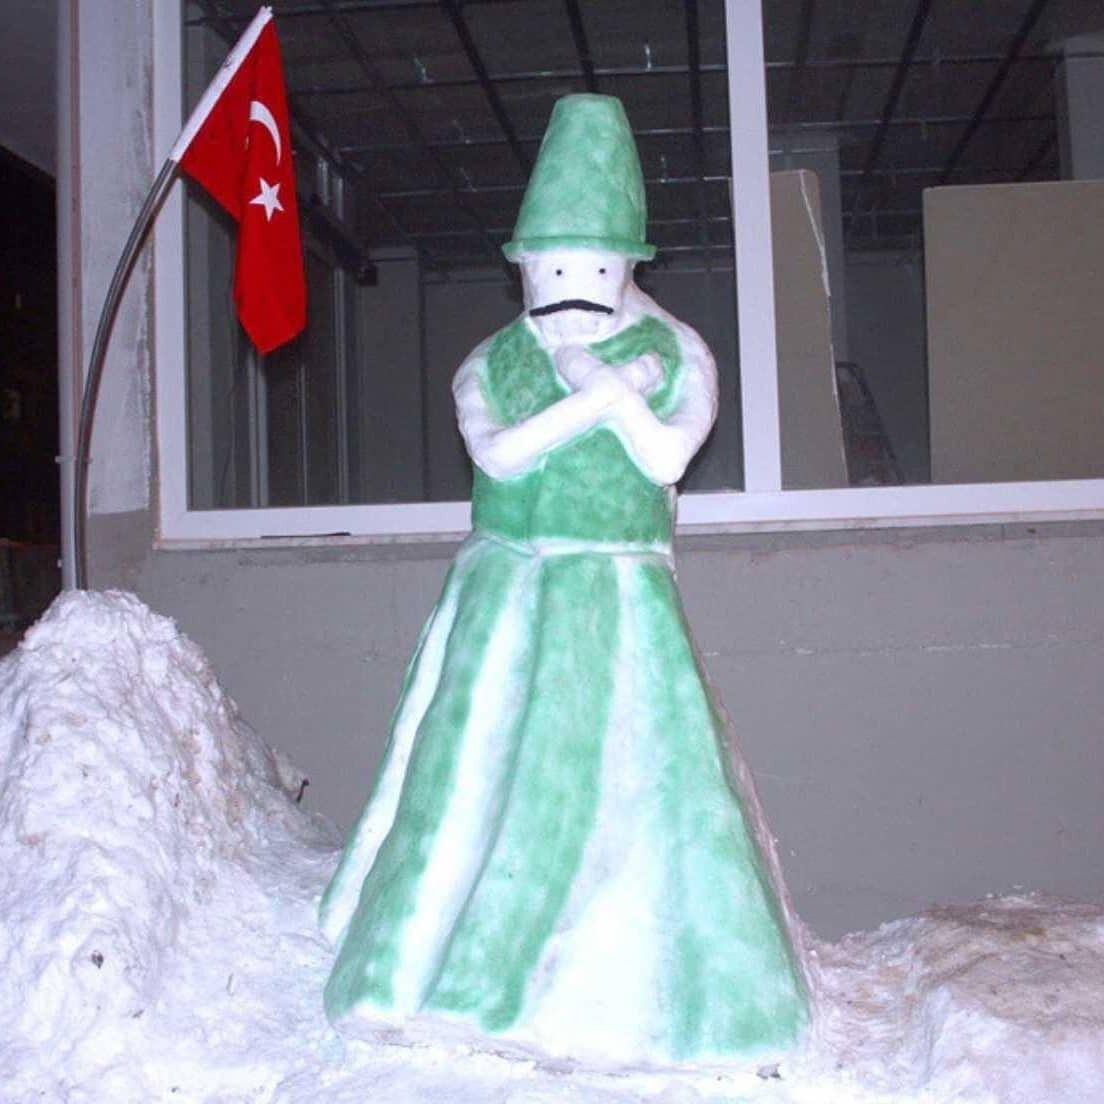 Bursa'da hayal gücünü zorlayan kardan adamlar! Kimi amuda kalkı kimi halay çekti